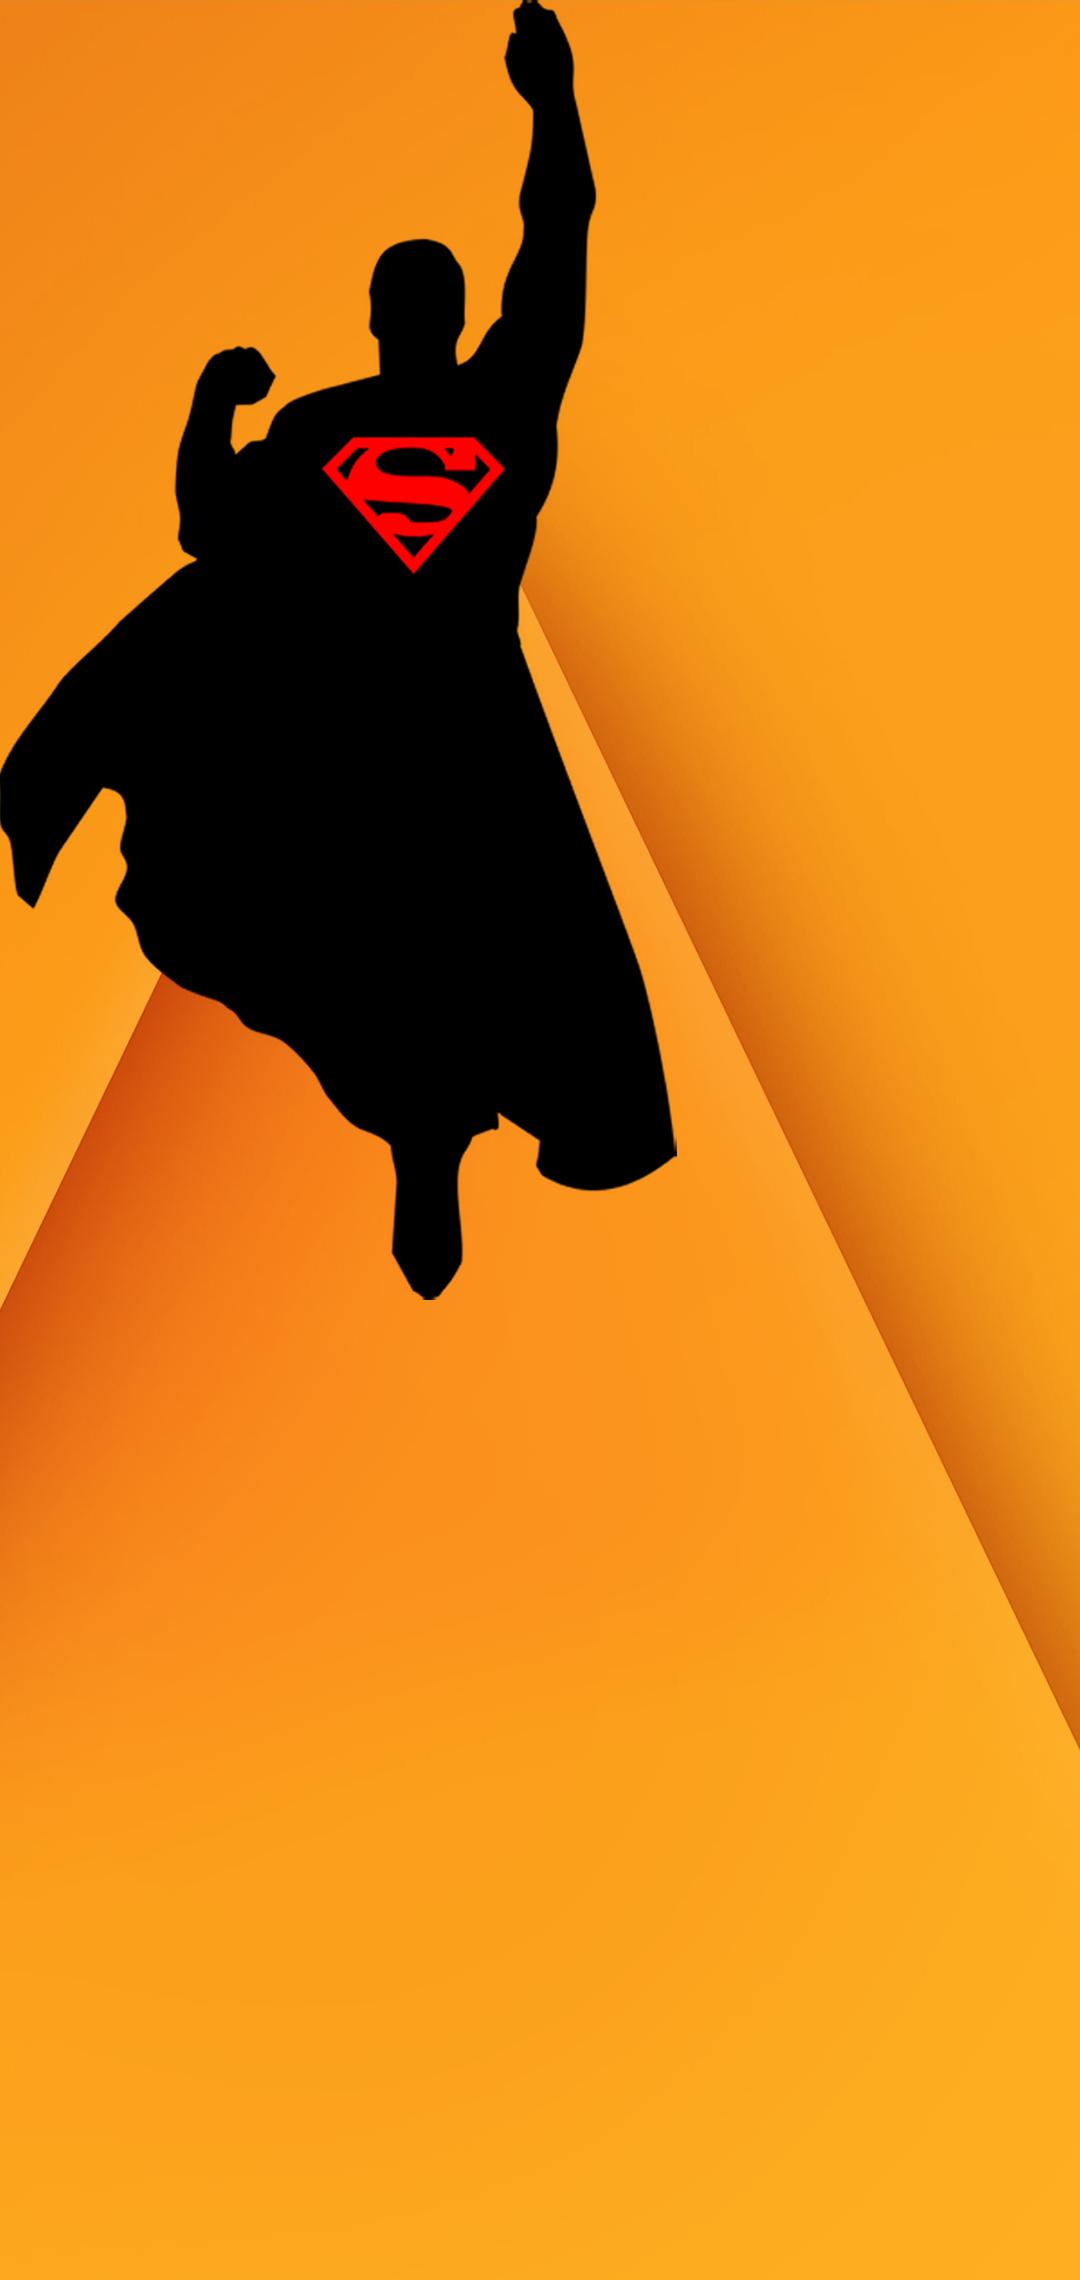 superman hole-punch wallpaper